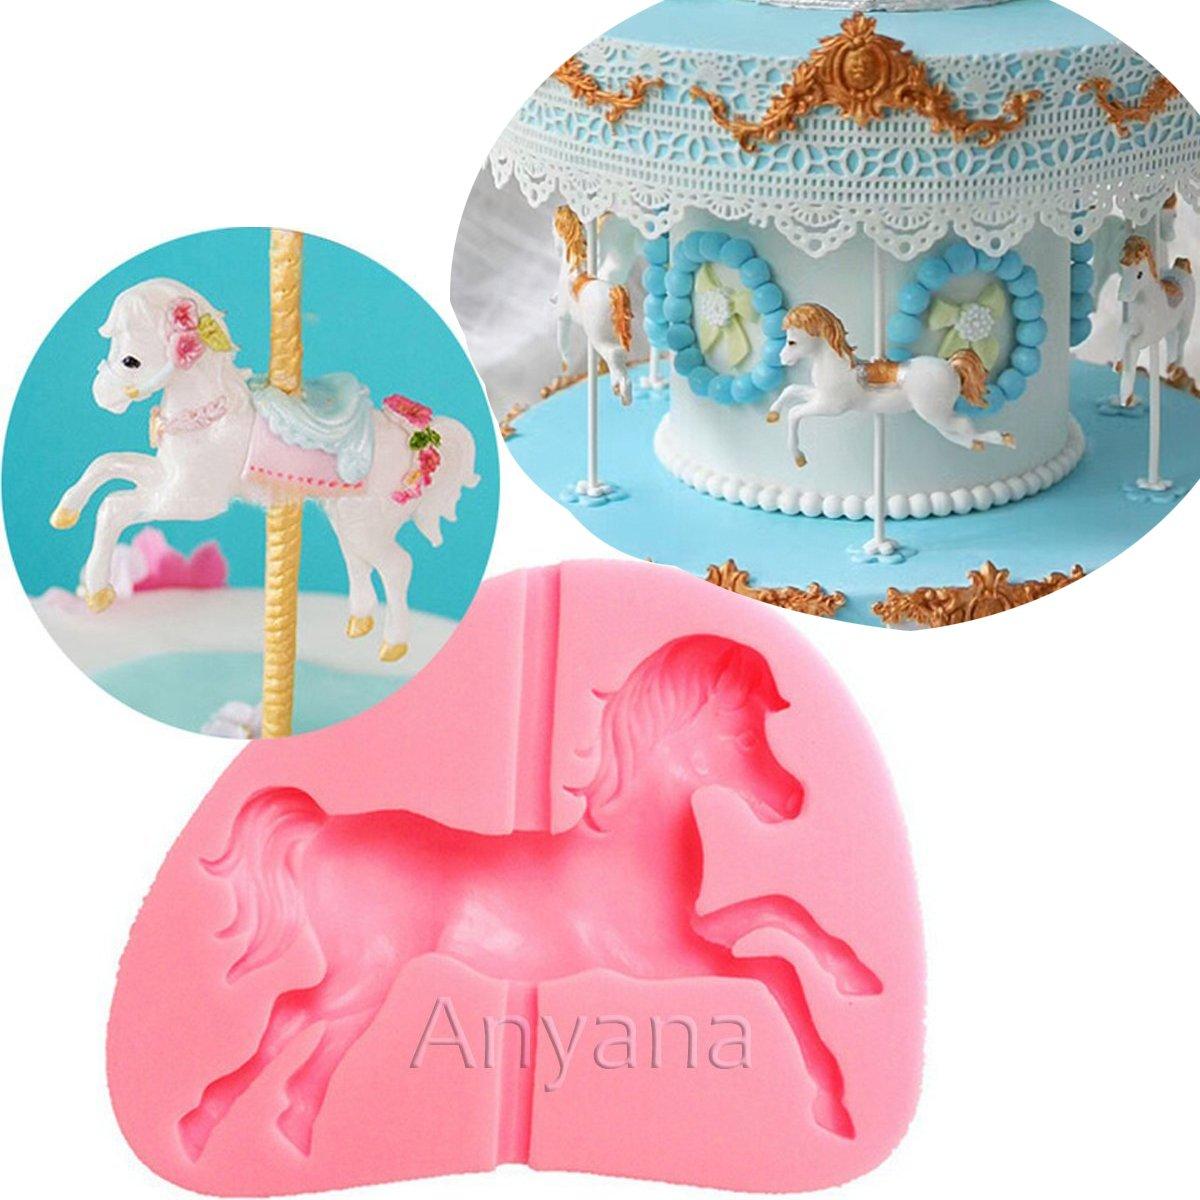 Anyana Merry Go Round Carousel Horse Silicone Animal Mould Cake Fondant Gum Paste Mold For Sugar Paste Birthday Cupcake Decorating Topper Decoration Sugarcraft Decor